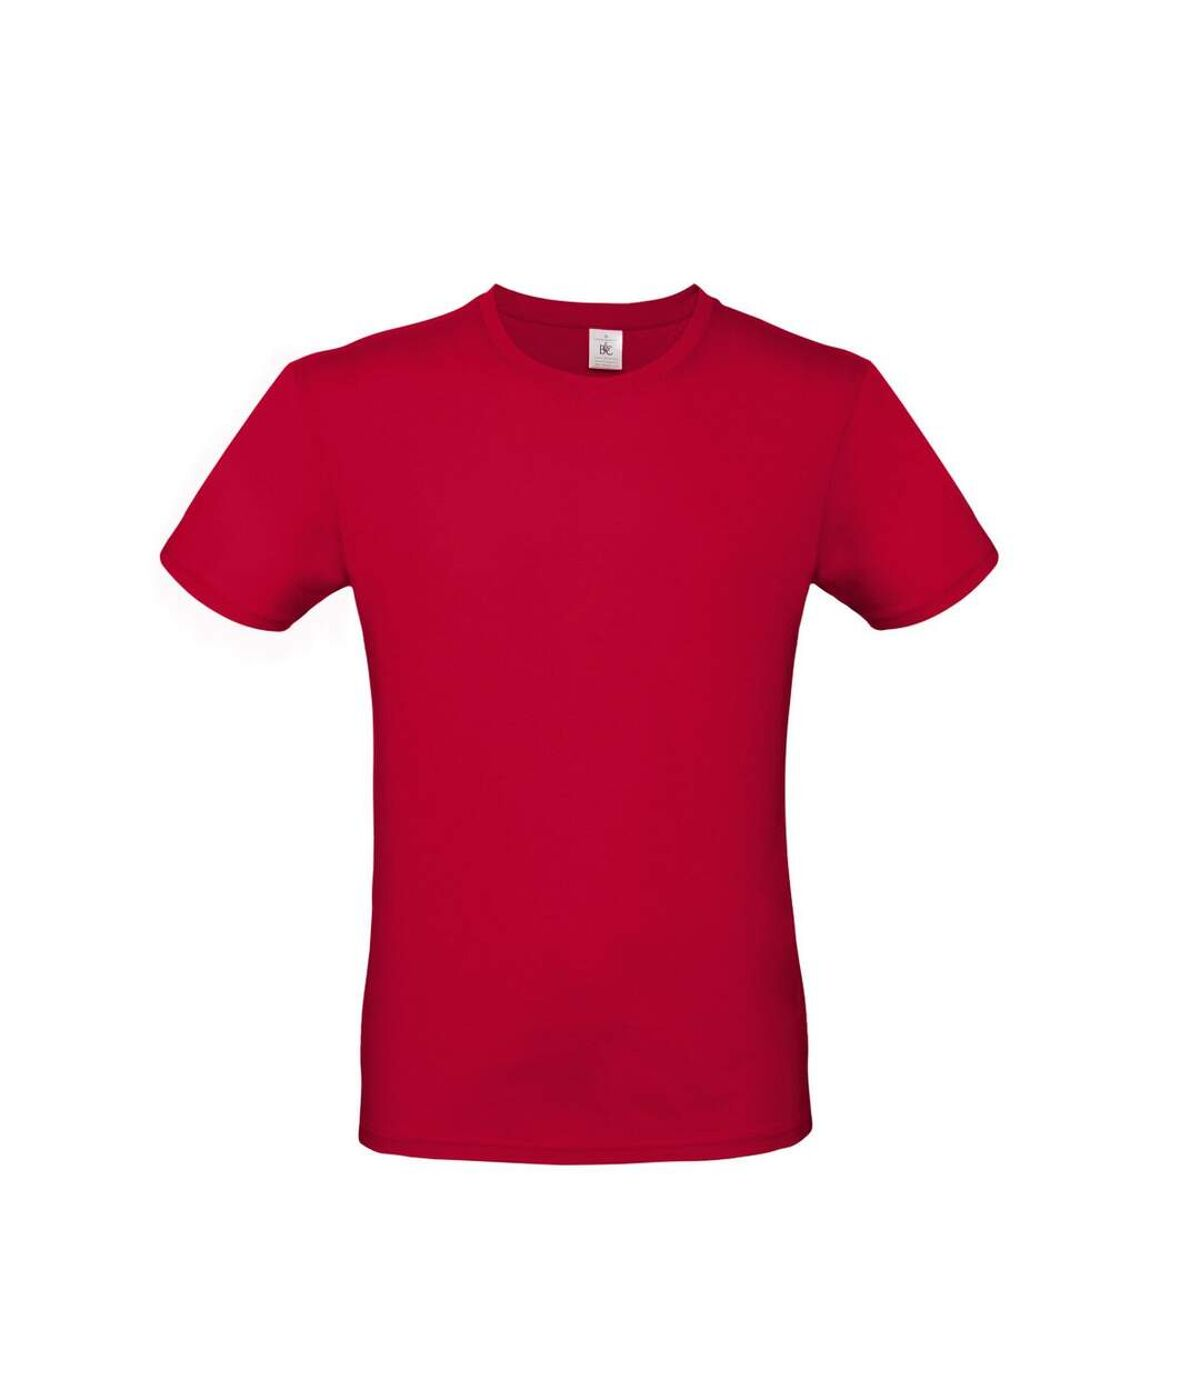 B&C Mens #E150 Tee (Deep Red) - UTBC3910